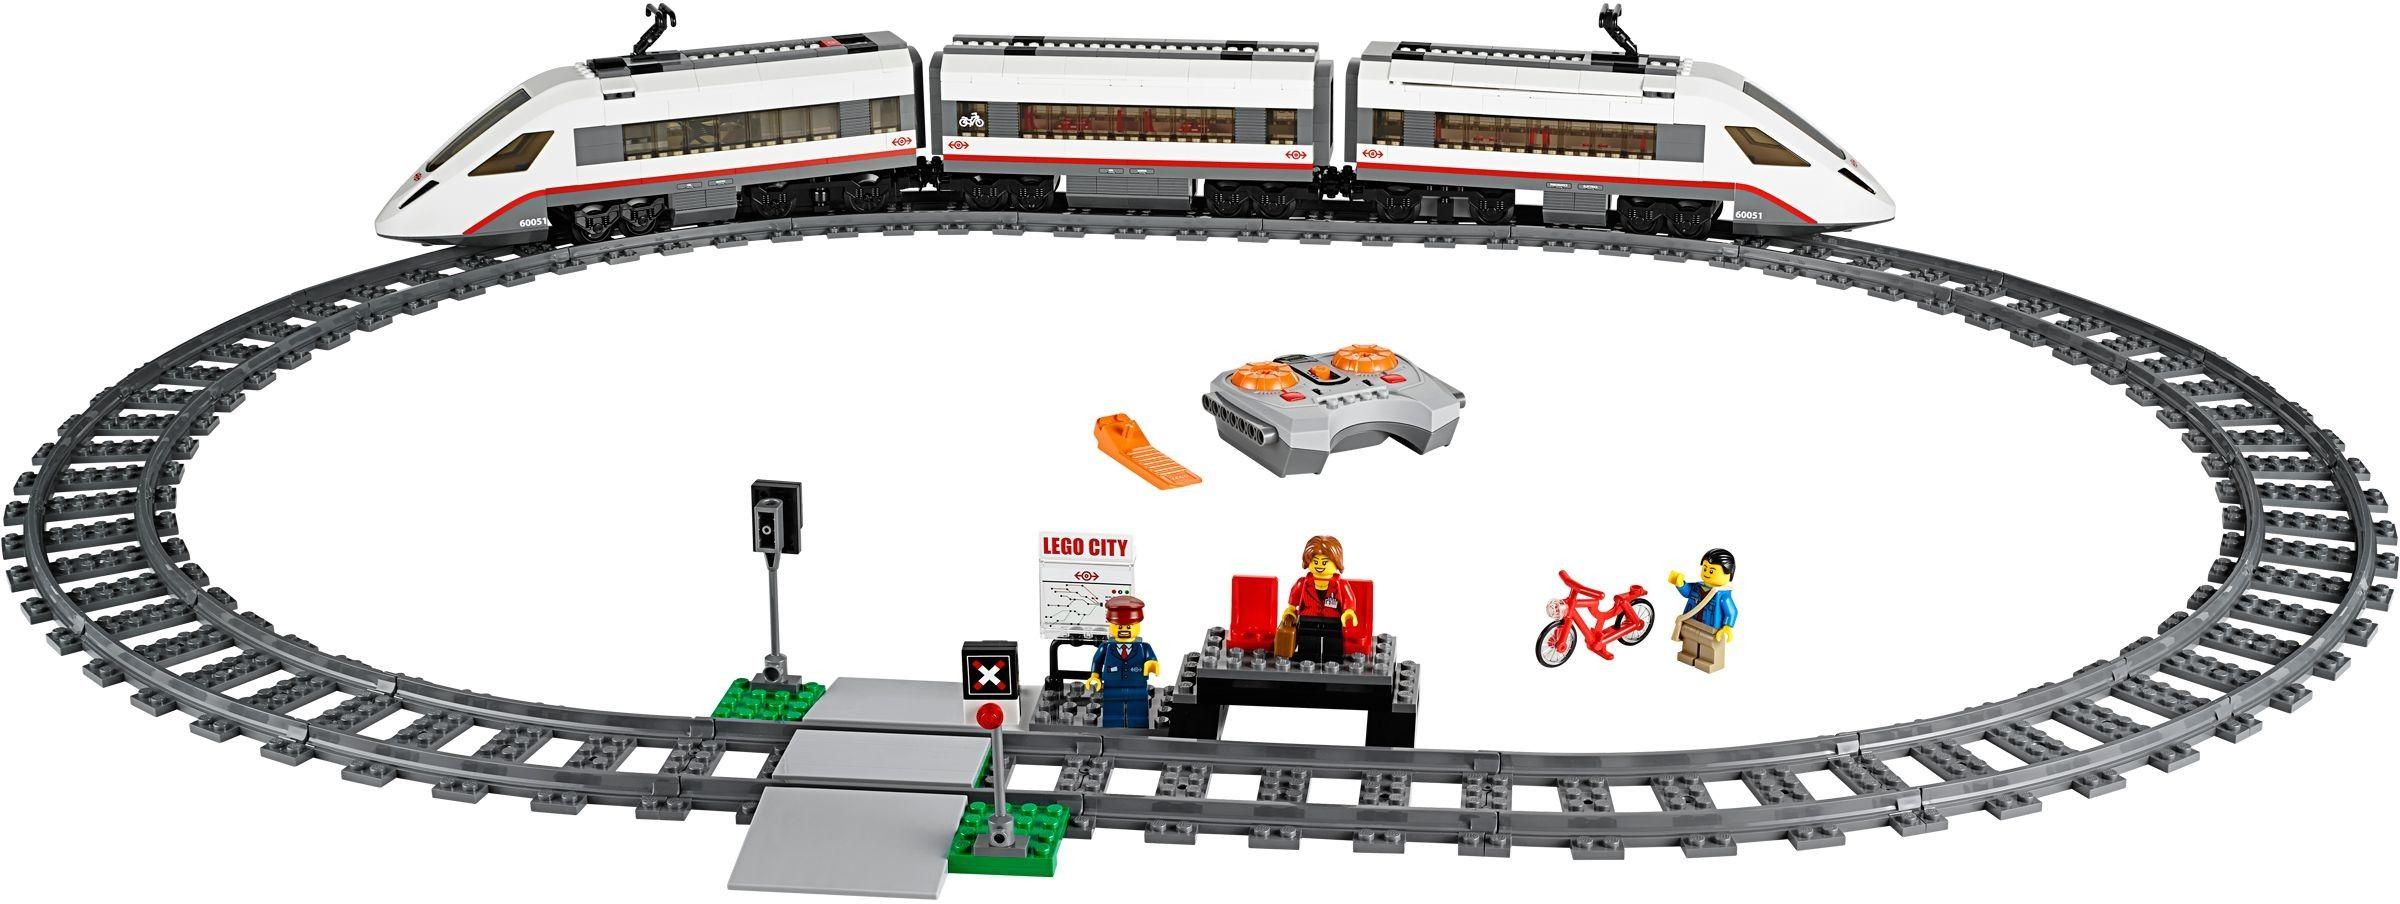 60051 1 High Speed Passenger Train Lego City Train Toy Train